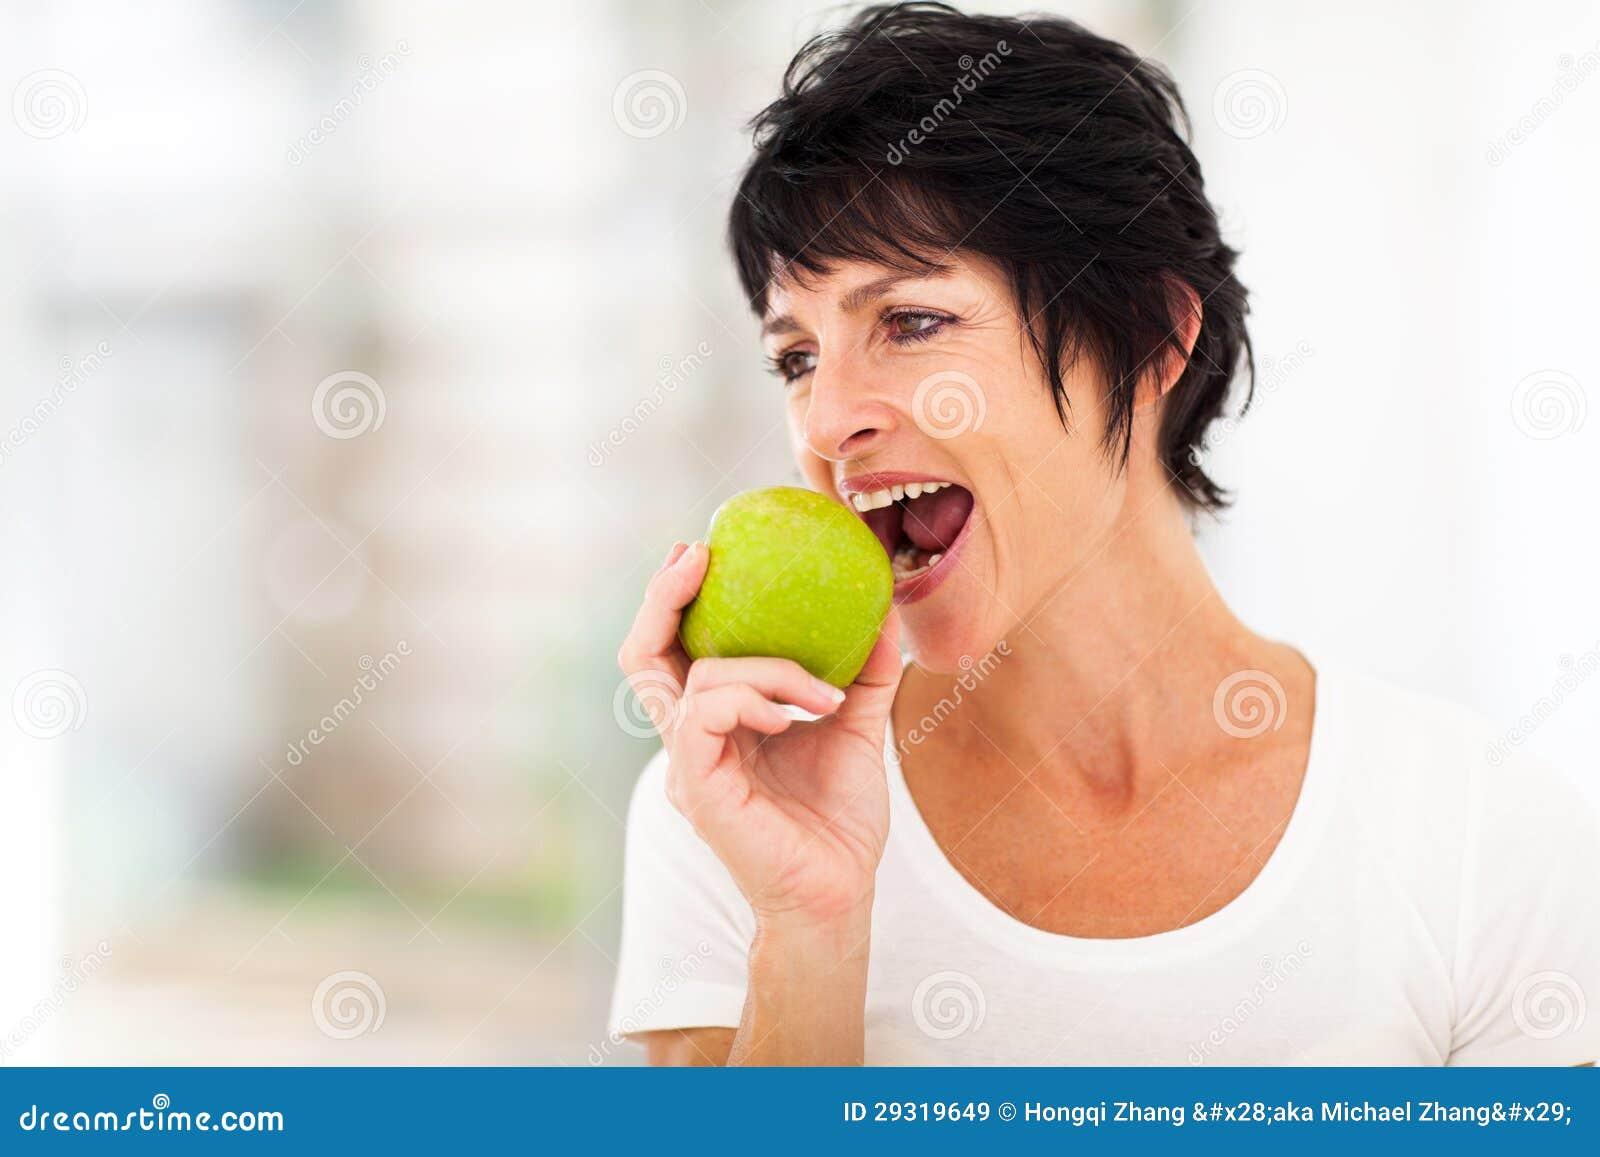 Mature Woman Apple Stock Image Image Of Caucasian, Lady - 29319649-7312